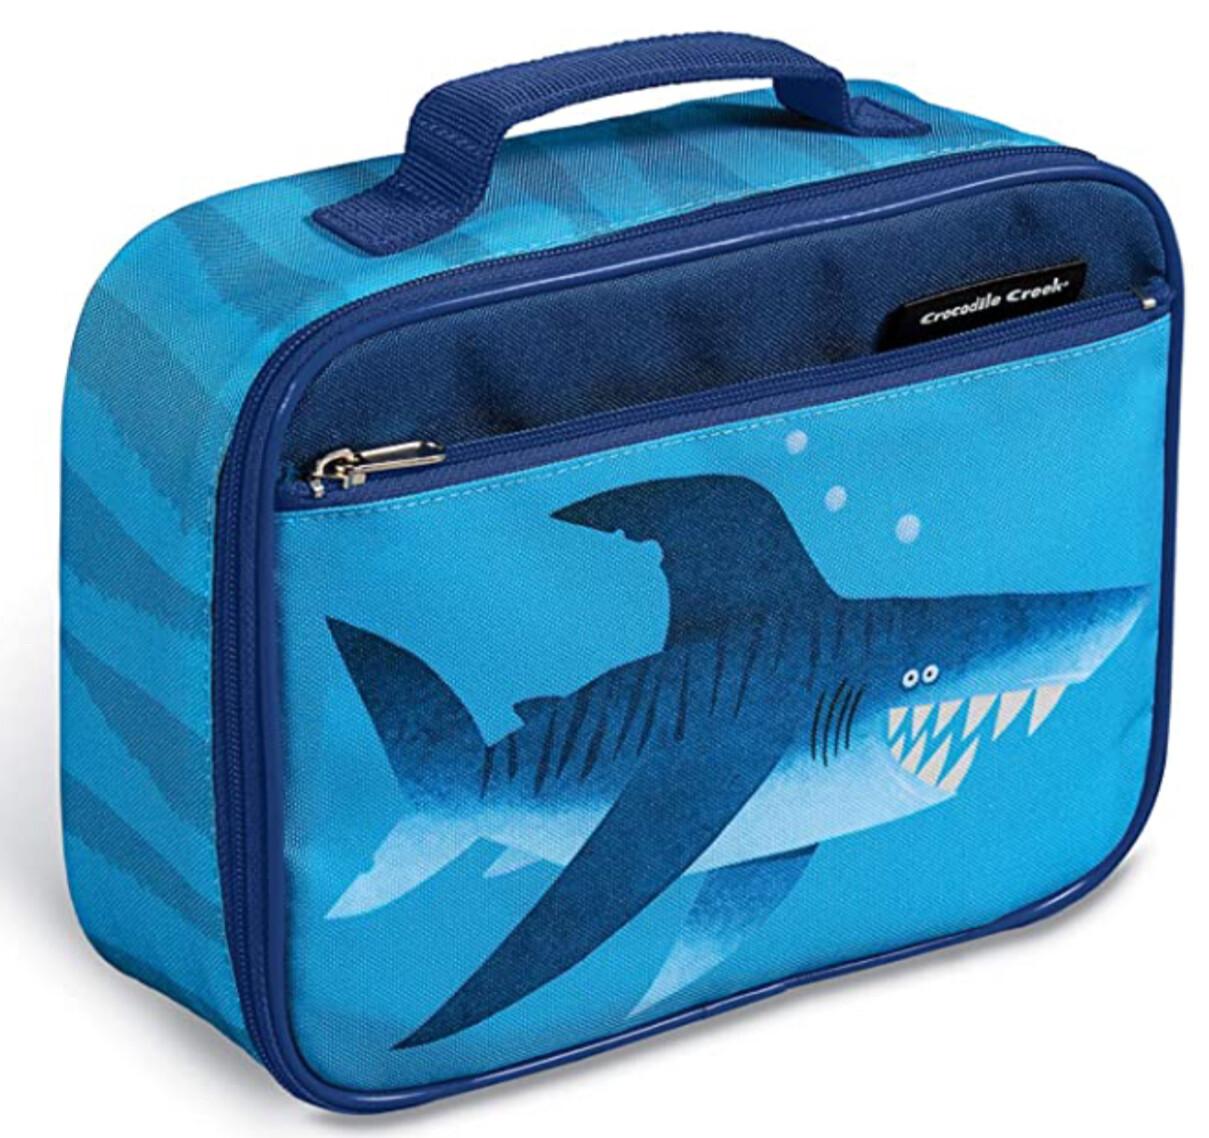 Lunchbox/Shark City